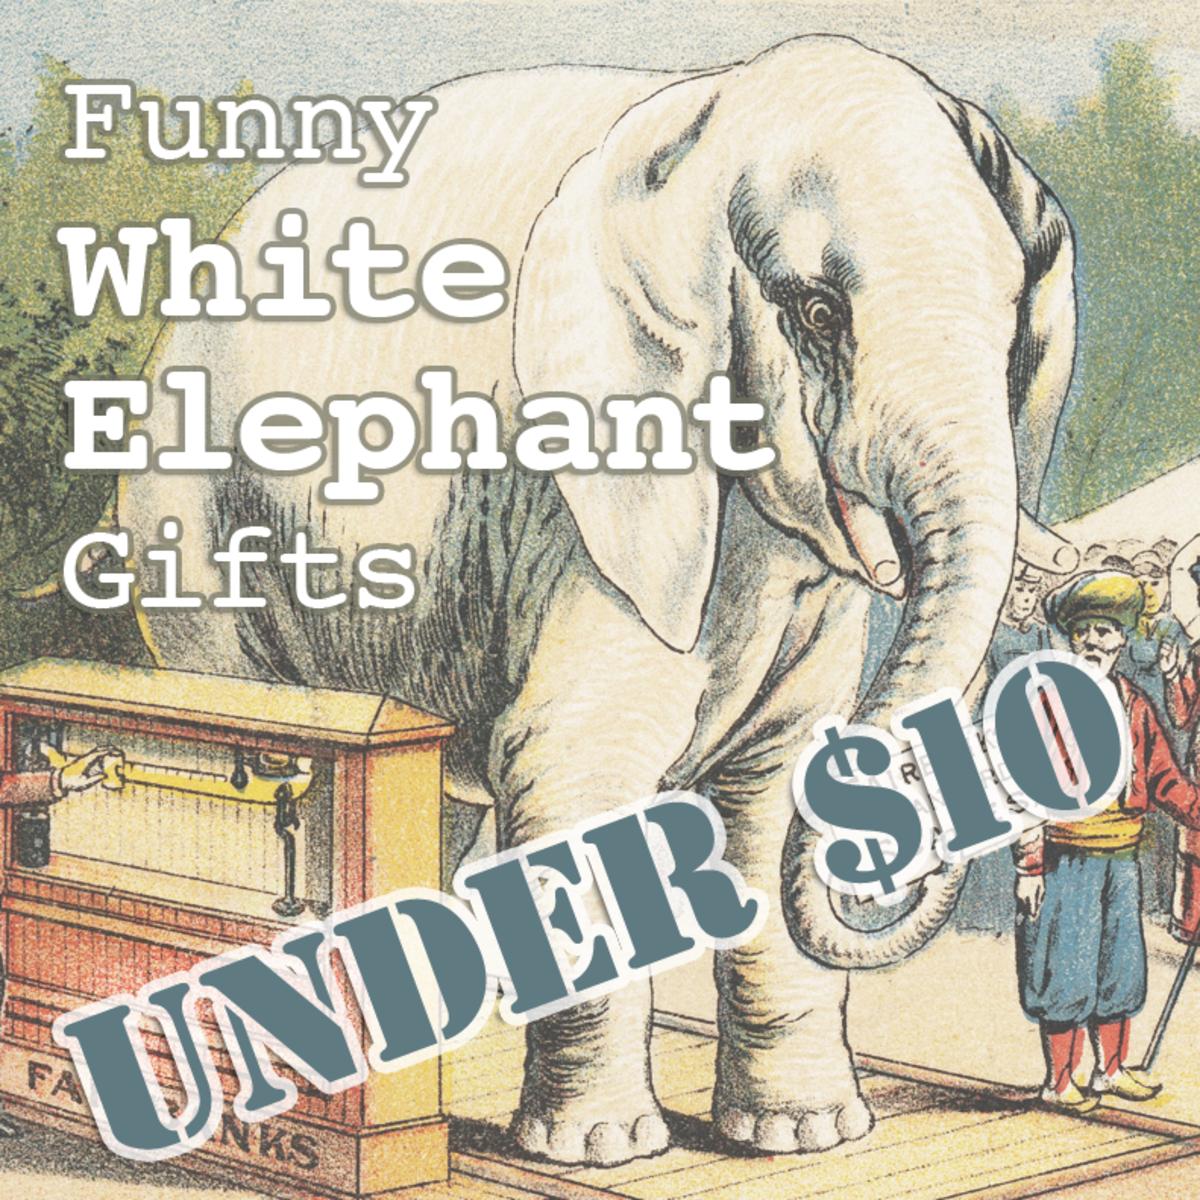 Funny White Elephant Gifts Under $10